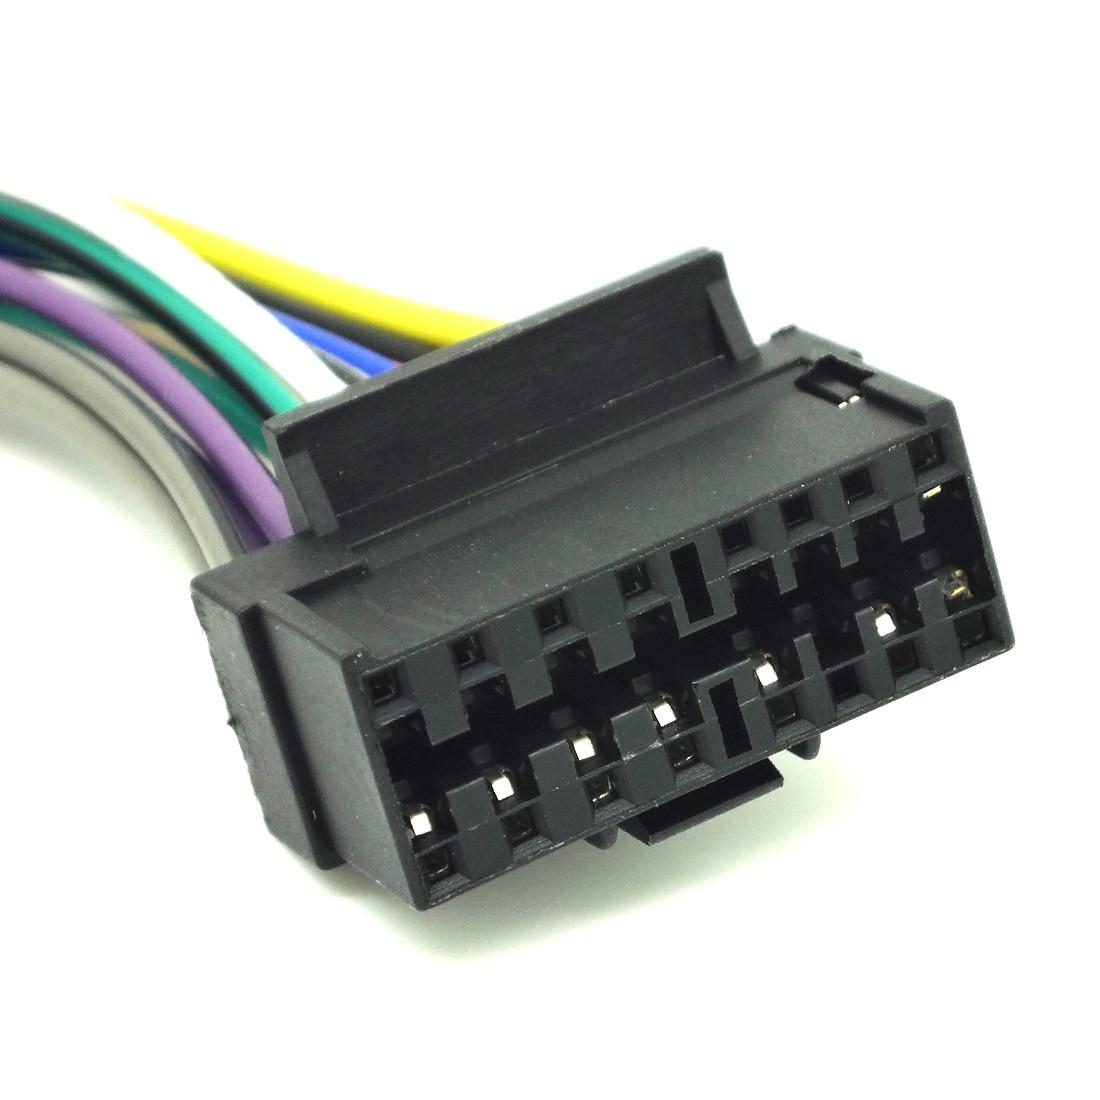 16 pin radio cd player stereo receiver wiring harness wire for jvc rh  aliexpress com JVC KD S37 JVC Car Radio